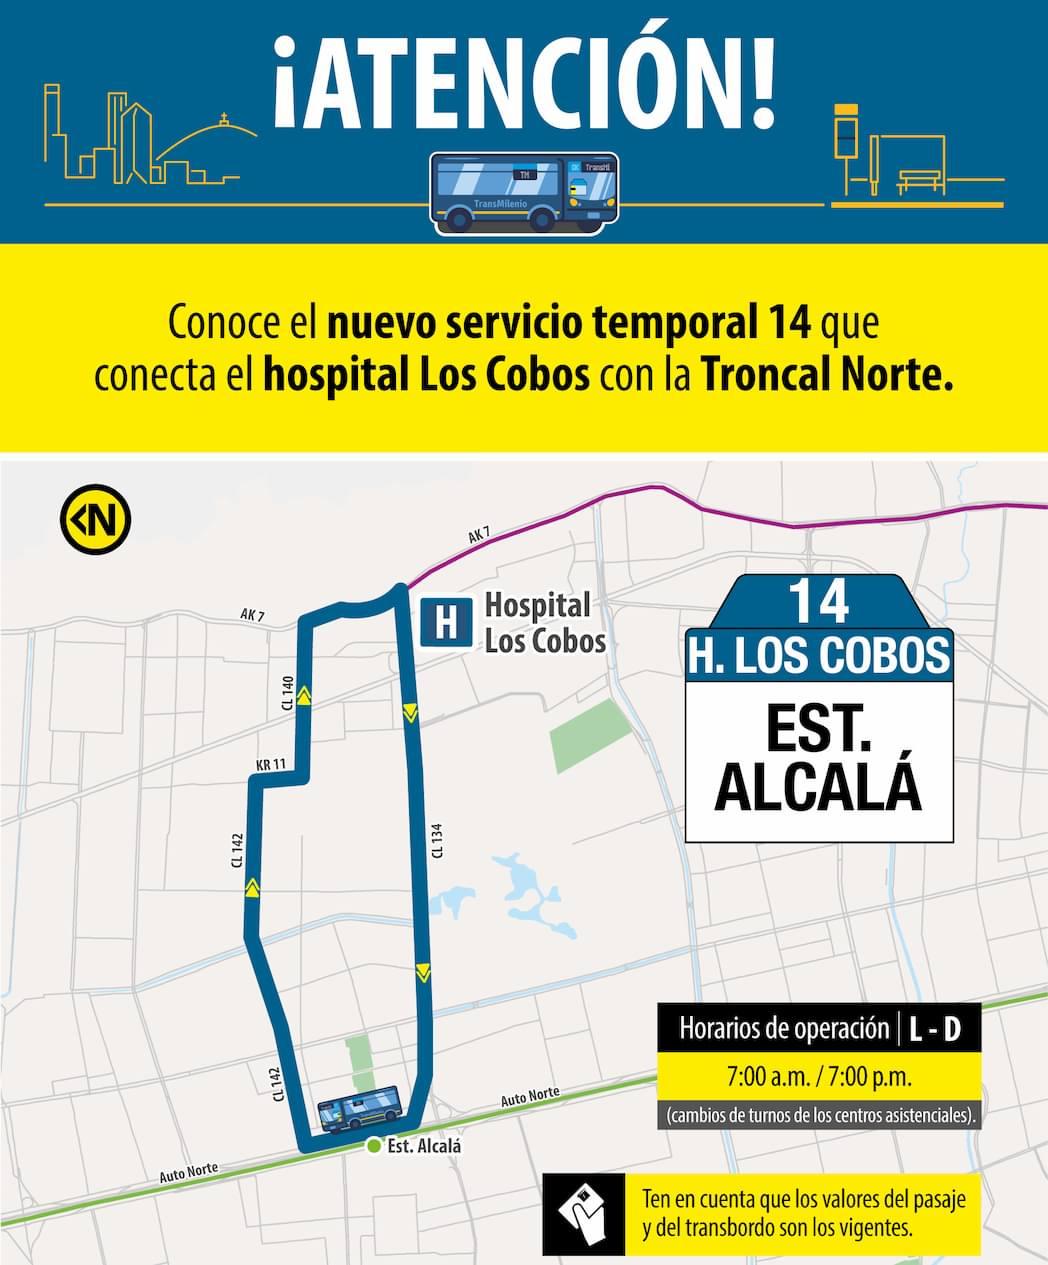 Ruta 14 Hospital Los Cobos, , mapa bus urbano Bogotá